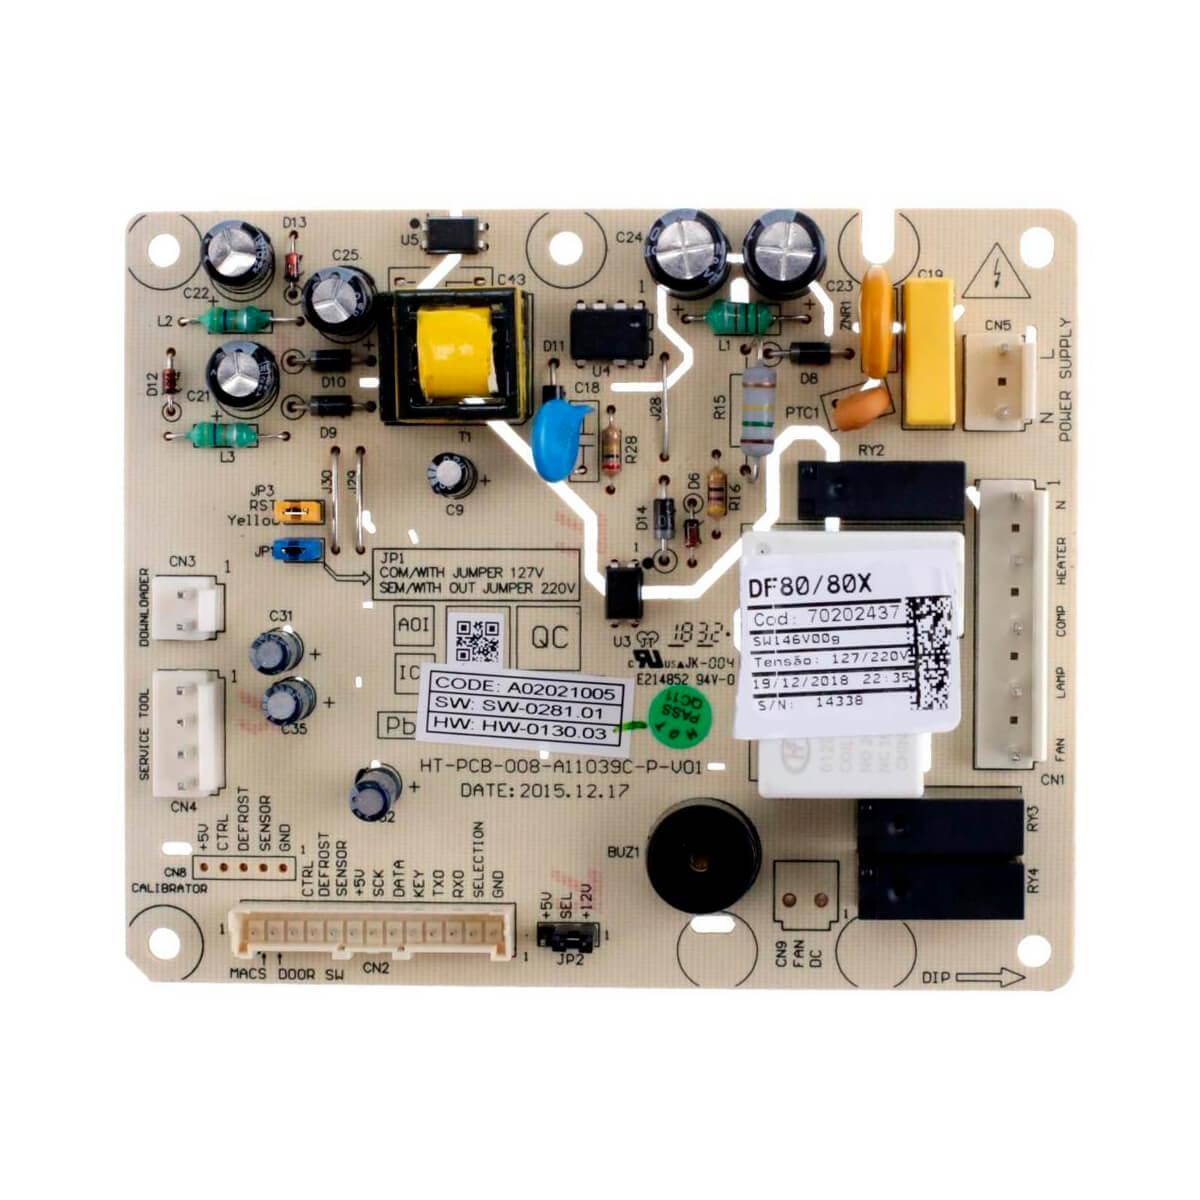 Placa De Potência ERF1500 Para Refrigerador Frost Free Electrolux DF80 DF80X - 70202437